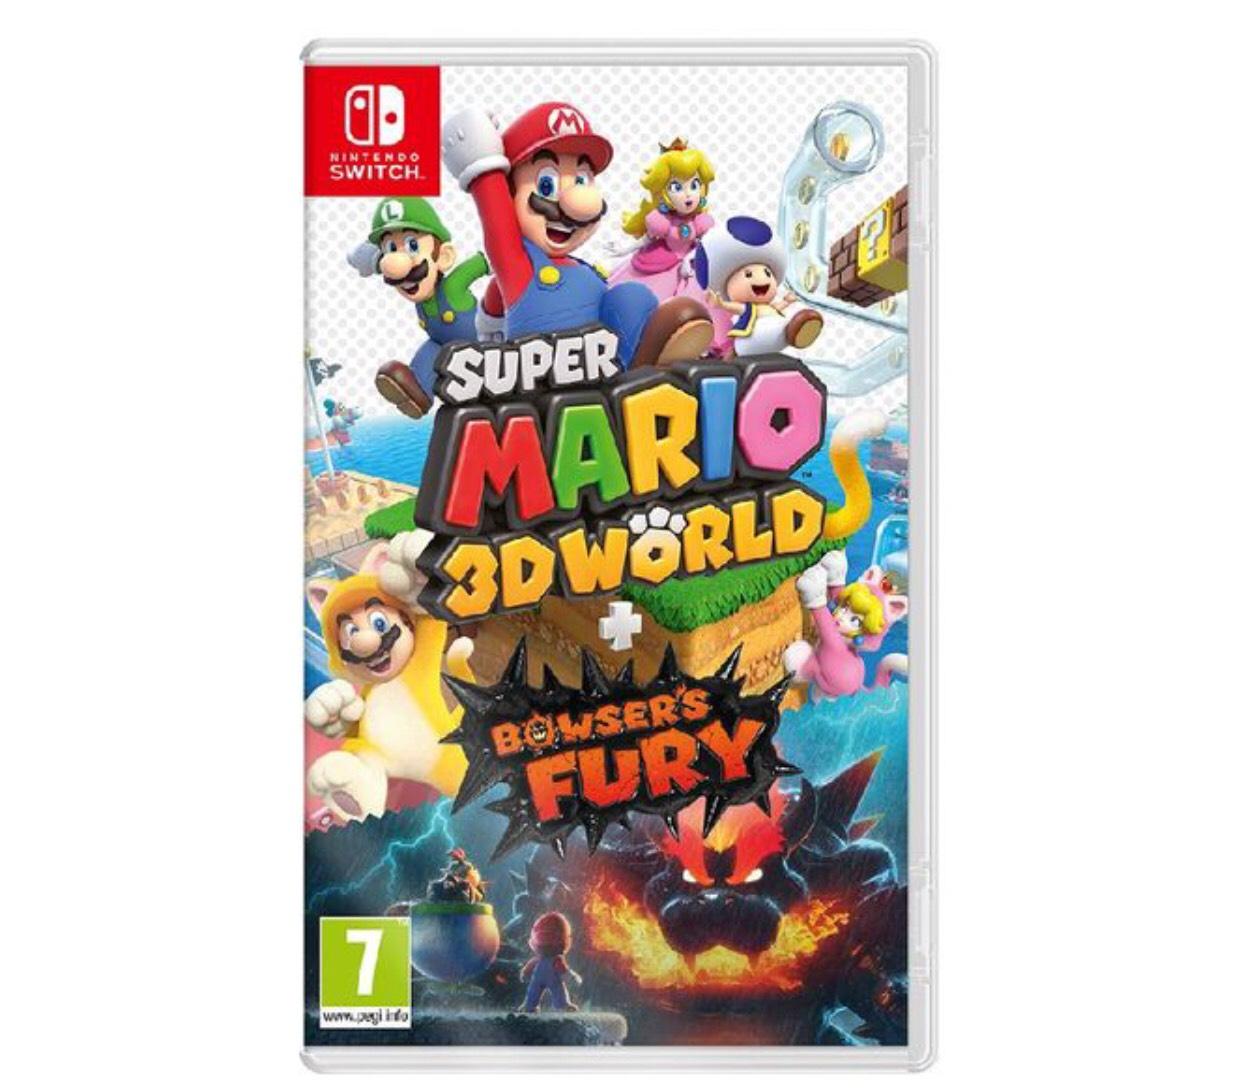 Super Mario 3D World + Bowser's Fury £39.85 @ ShopTo